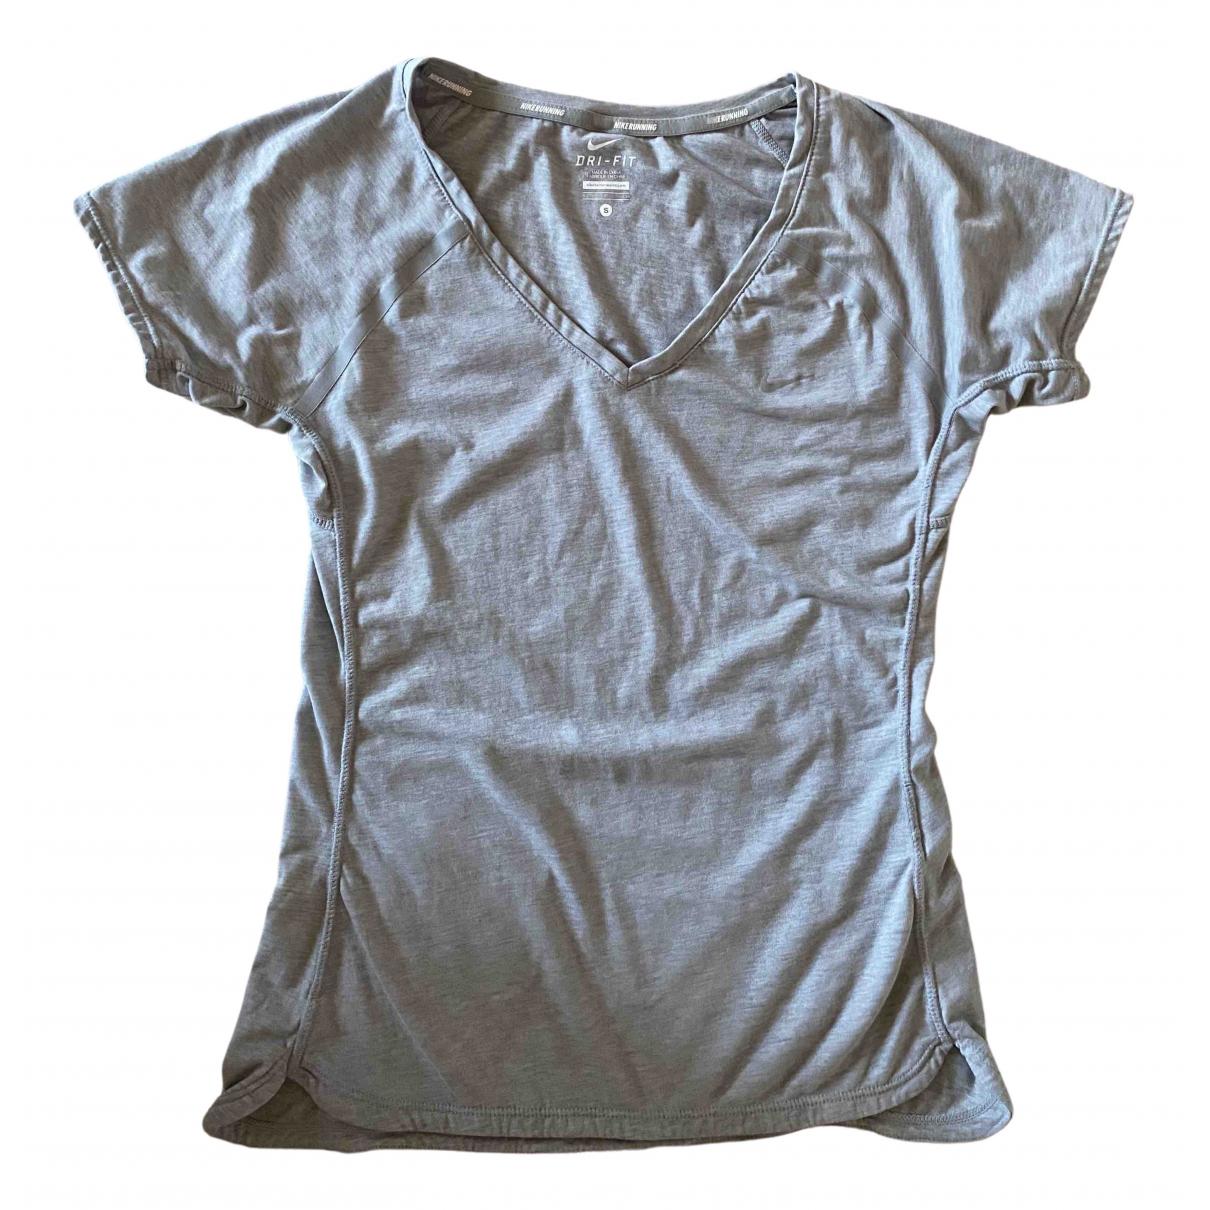 Nike \N Grey  top for Women S International